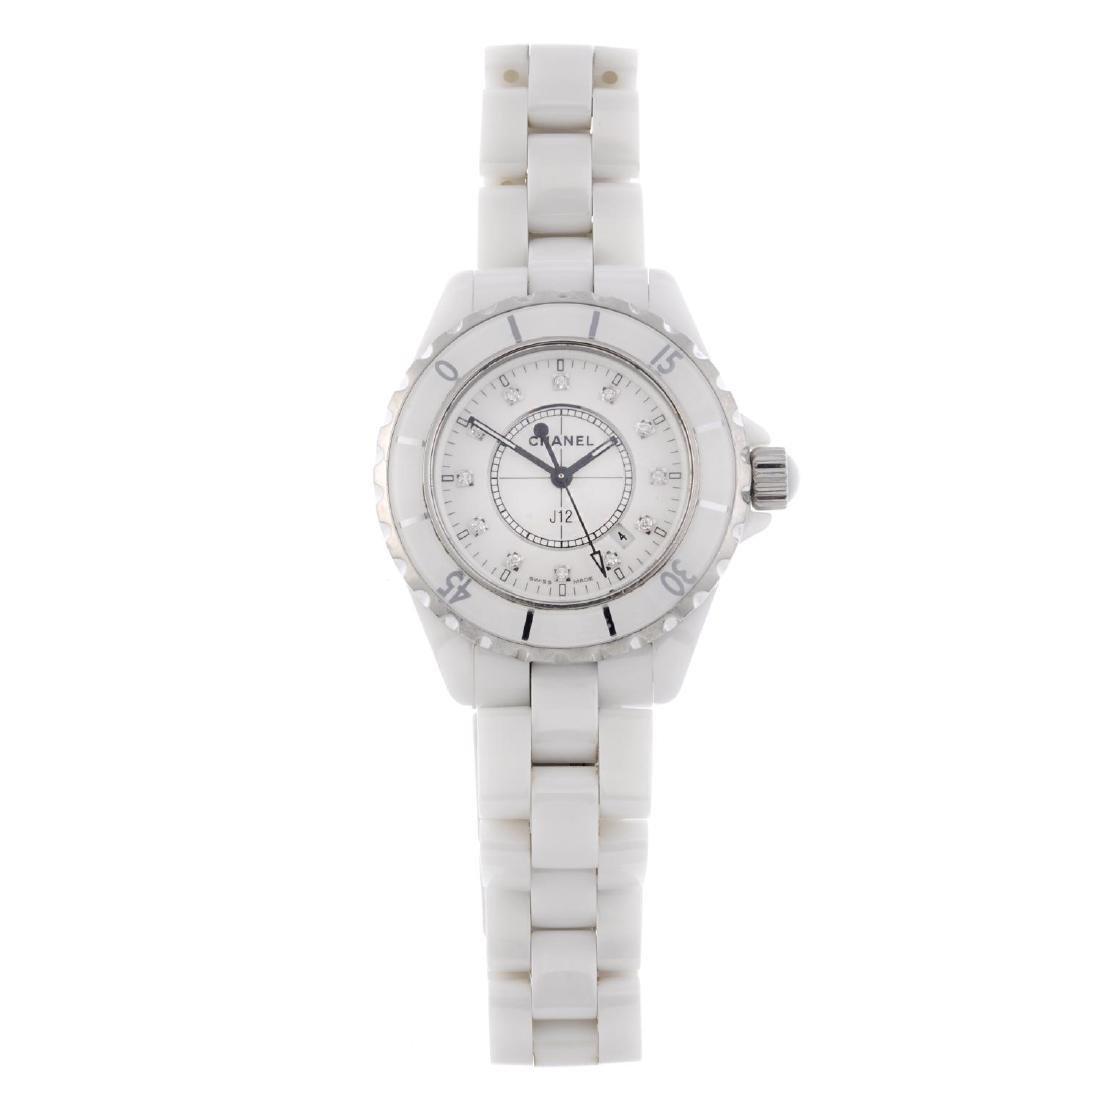 CHANEL - a lady's J12 bracelet watch. White ceramic